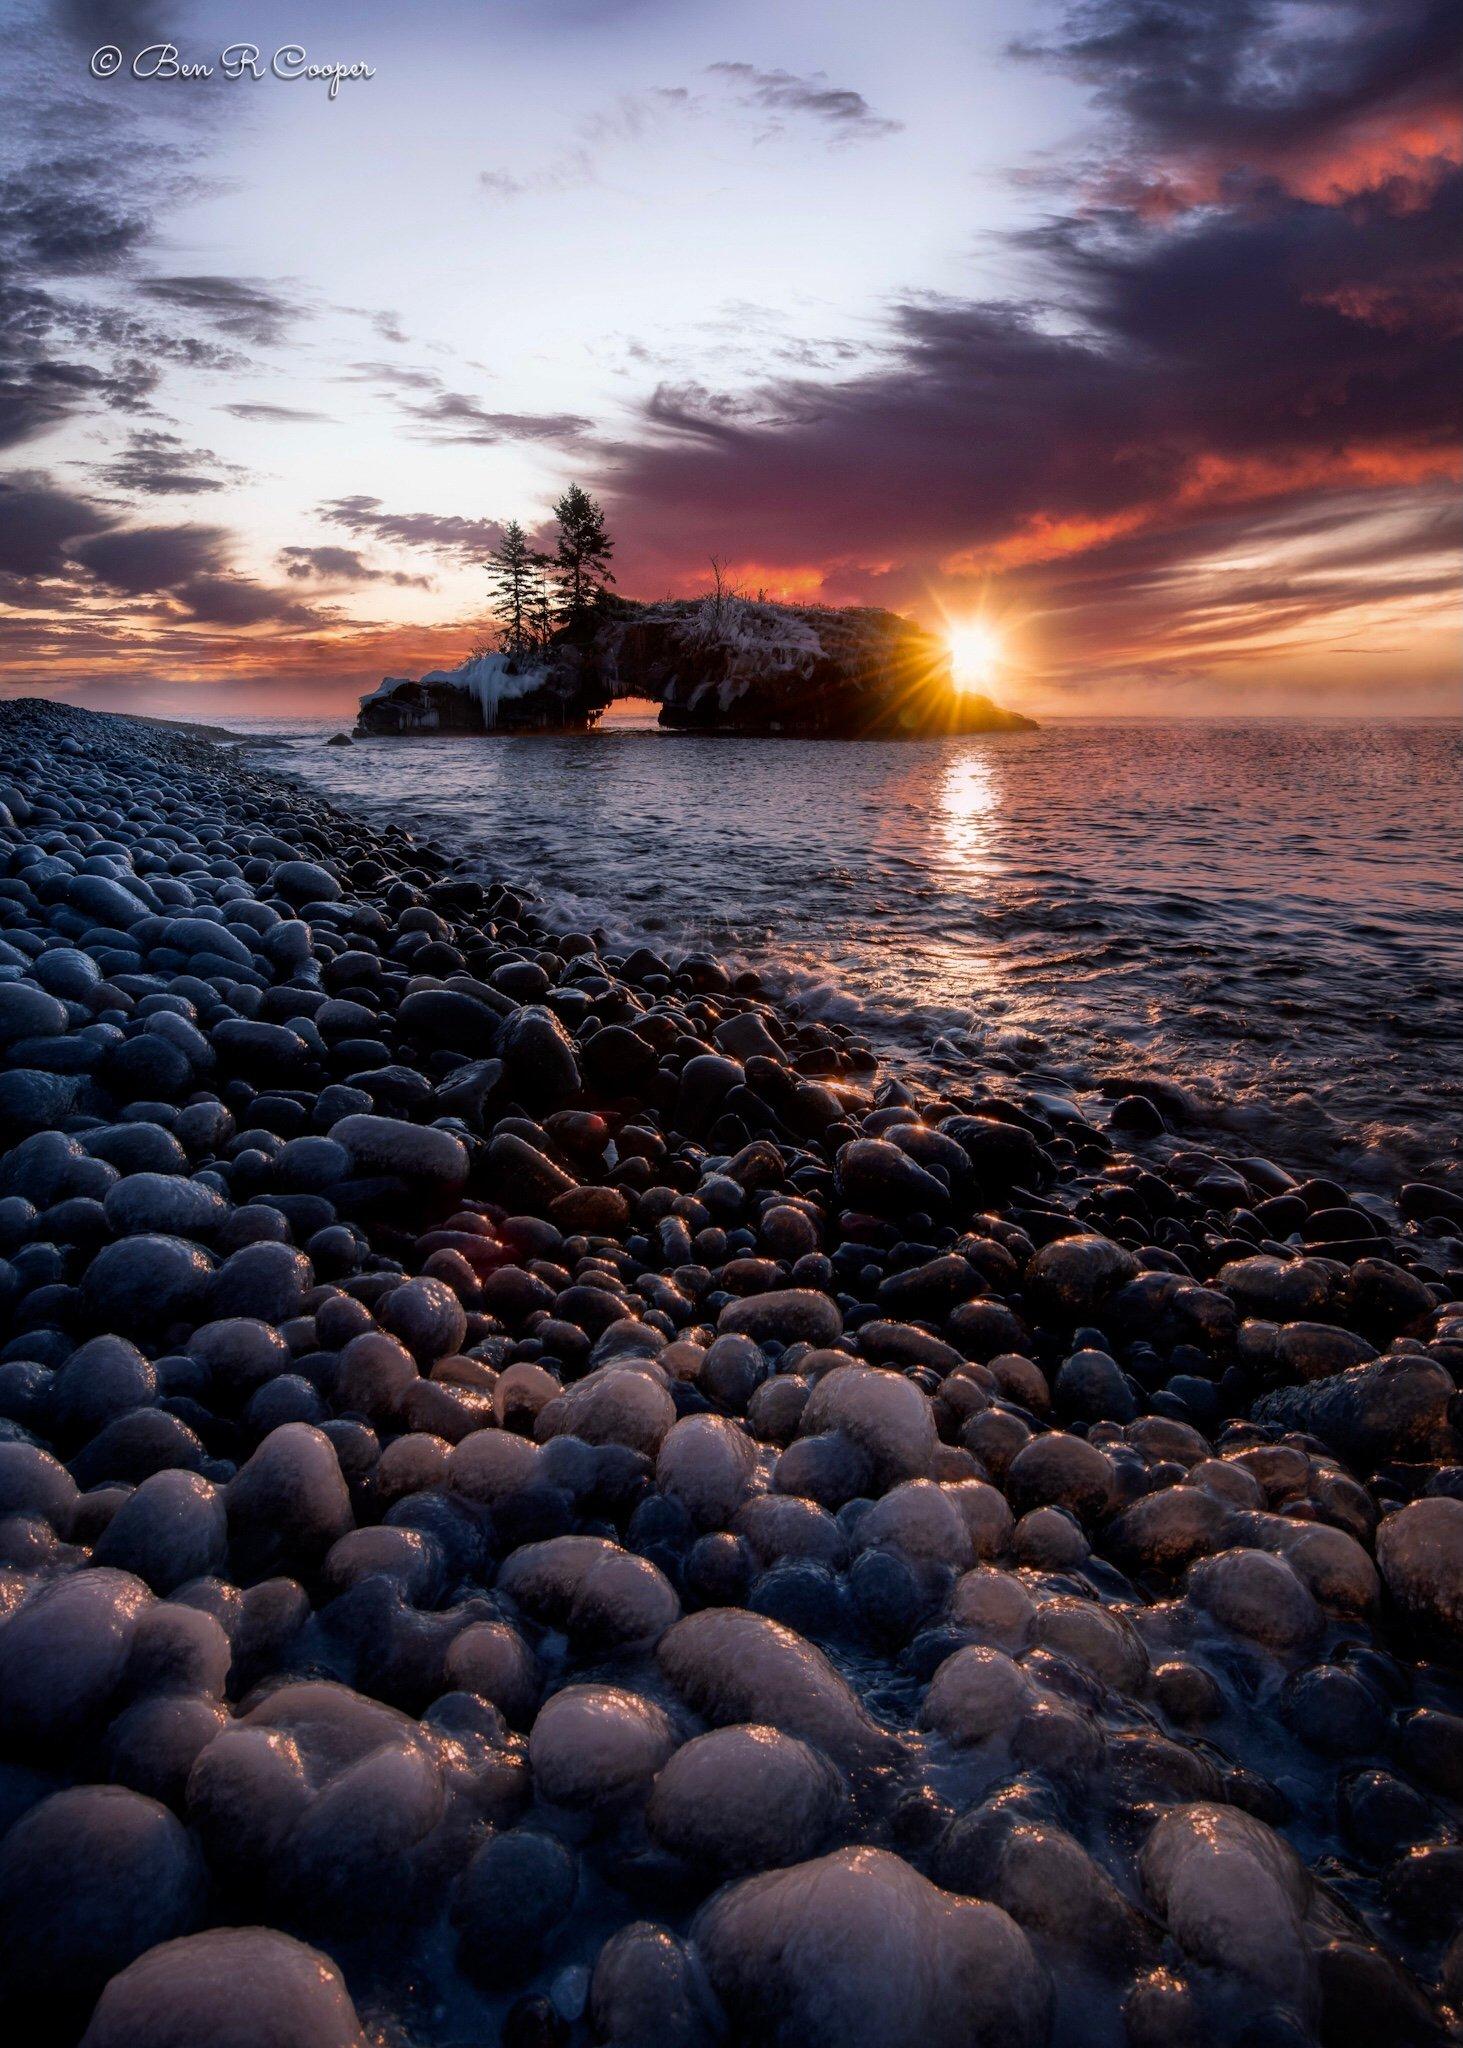 Daybreak on the North Shore